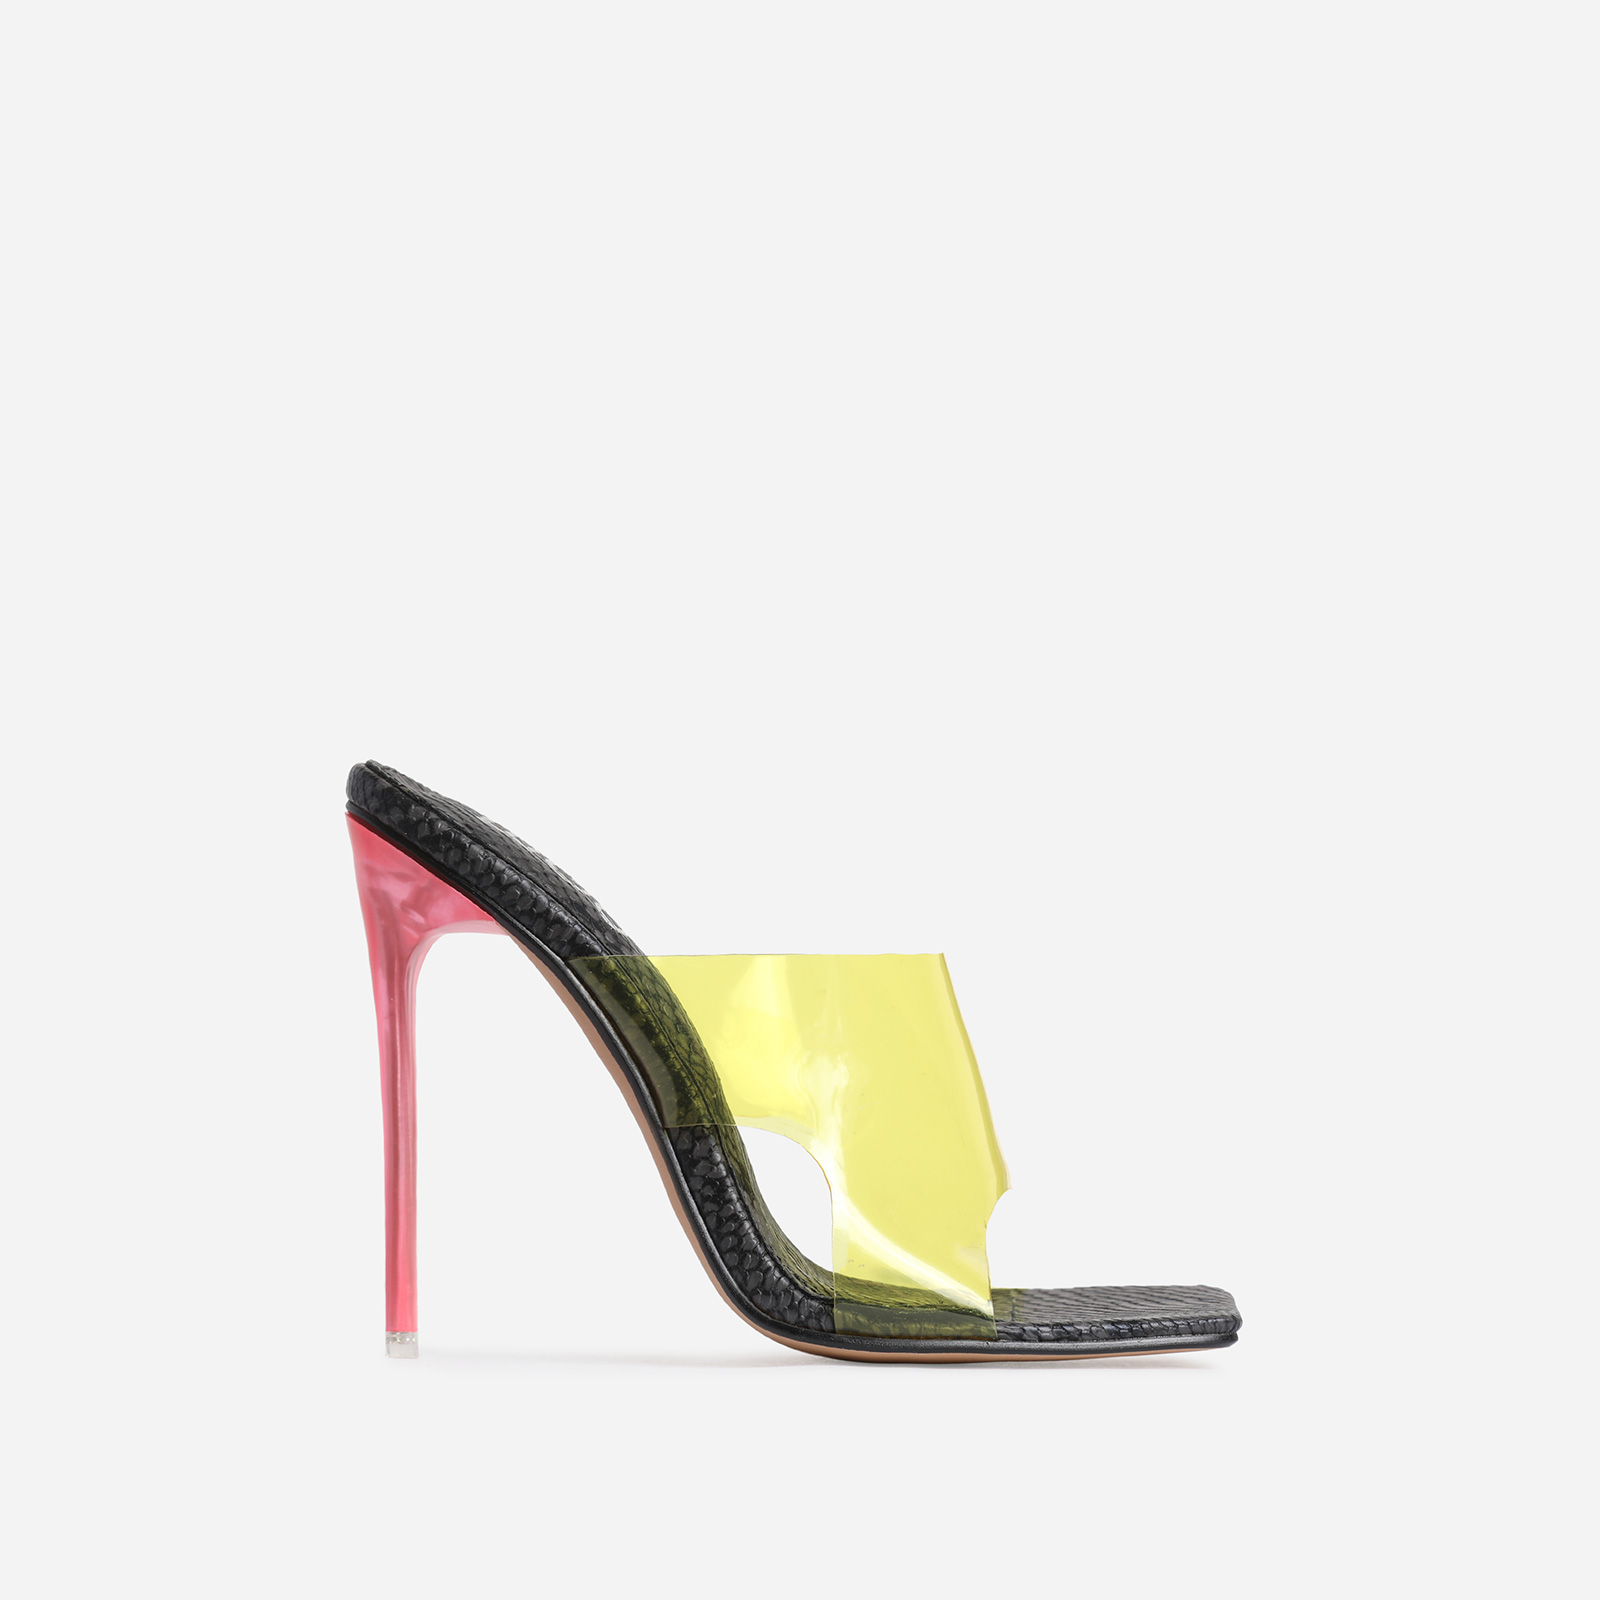 River Yellow Perspex Square Peep Toe Heel Mule In Black Snake Print Faux Leather